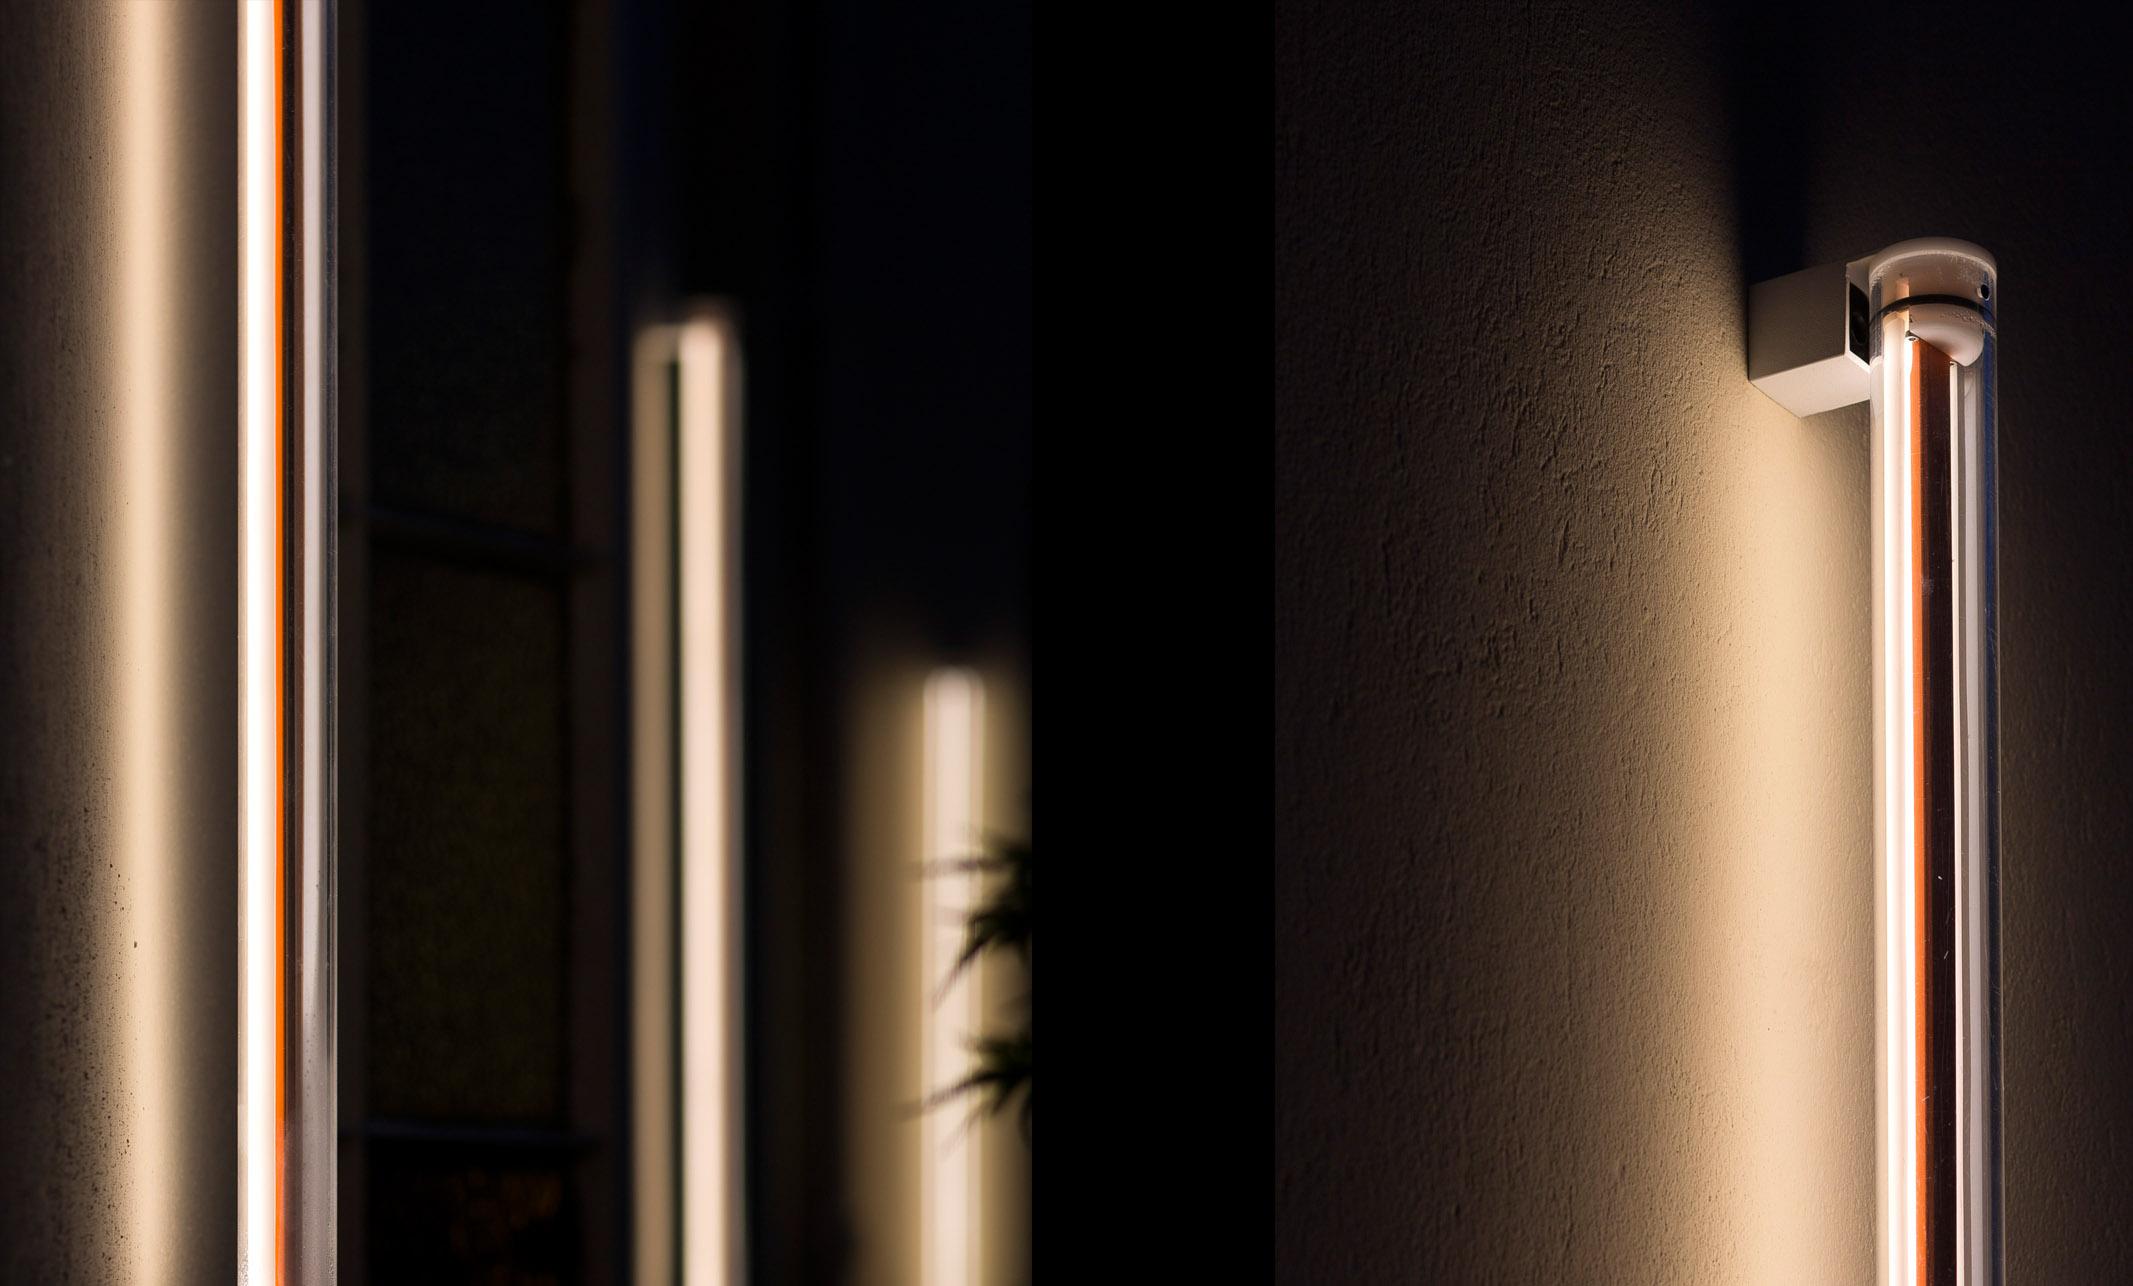 Foa-2018-Peruzzotti-008.jpg